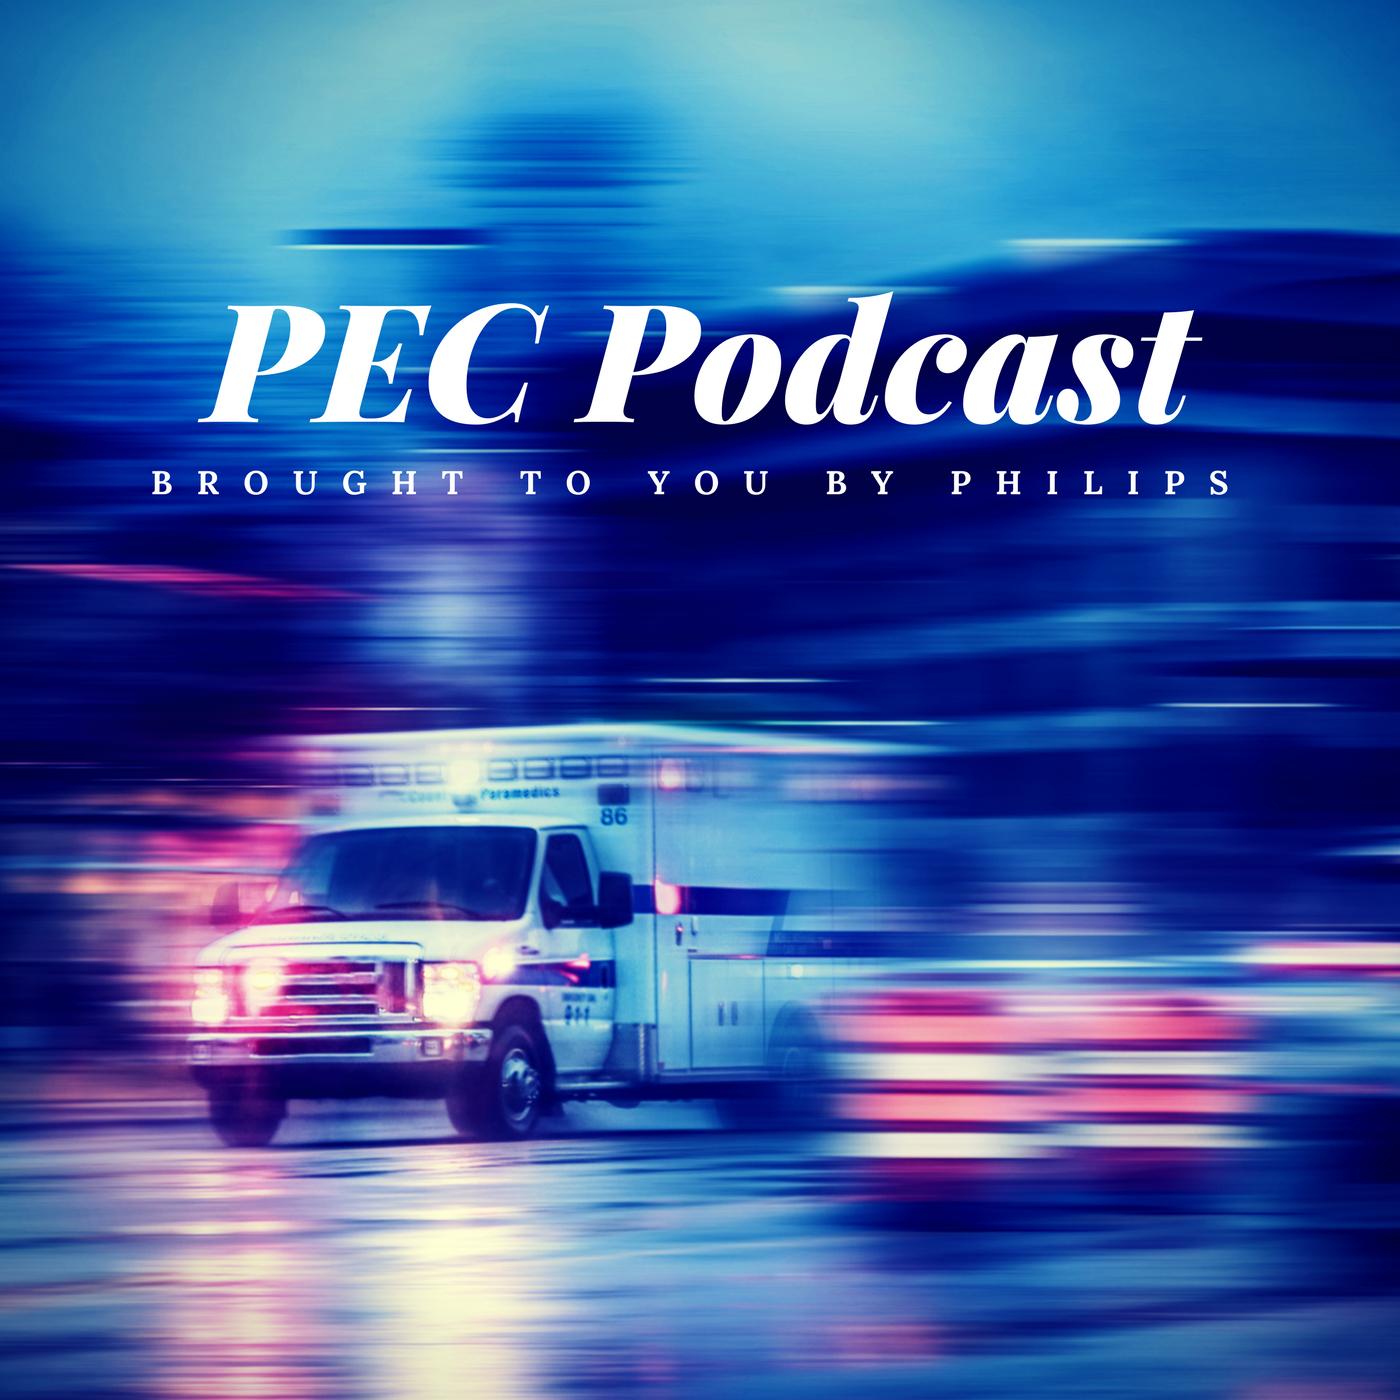 Prehospital Emergency Care Podcast - the NAEMSP Podcast